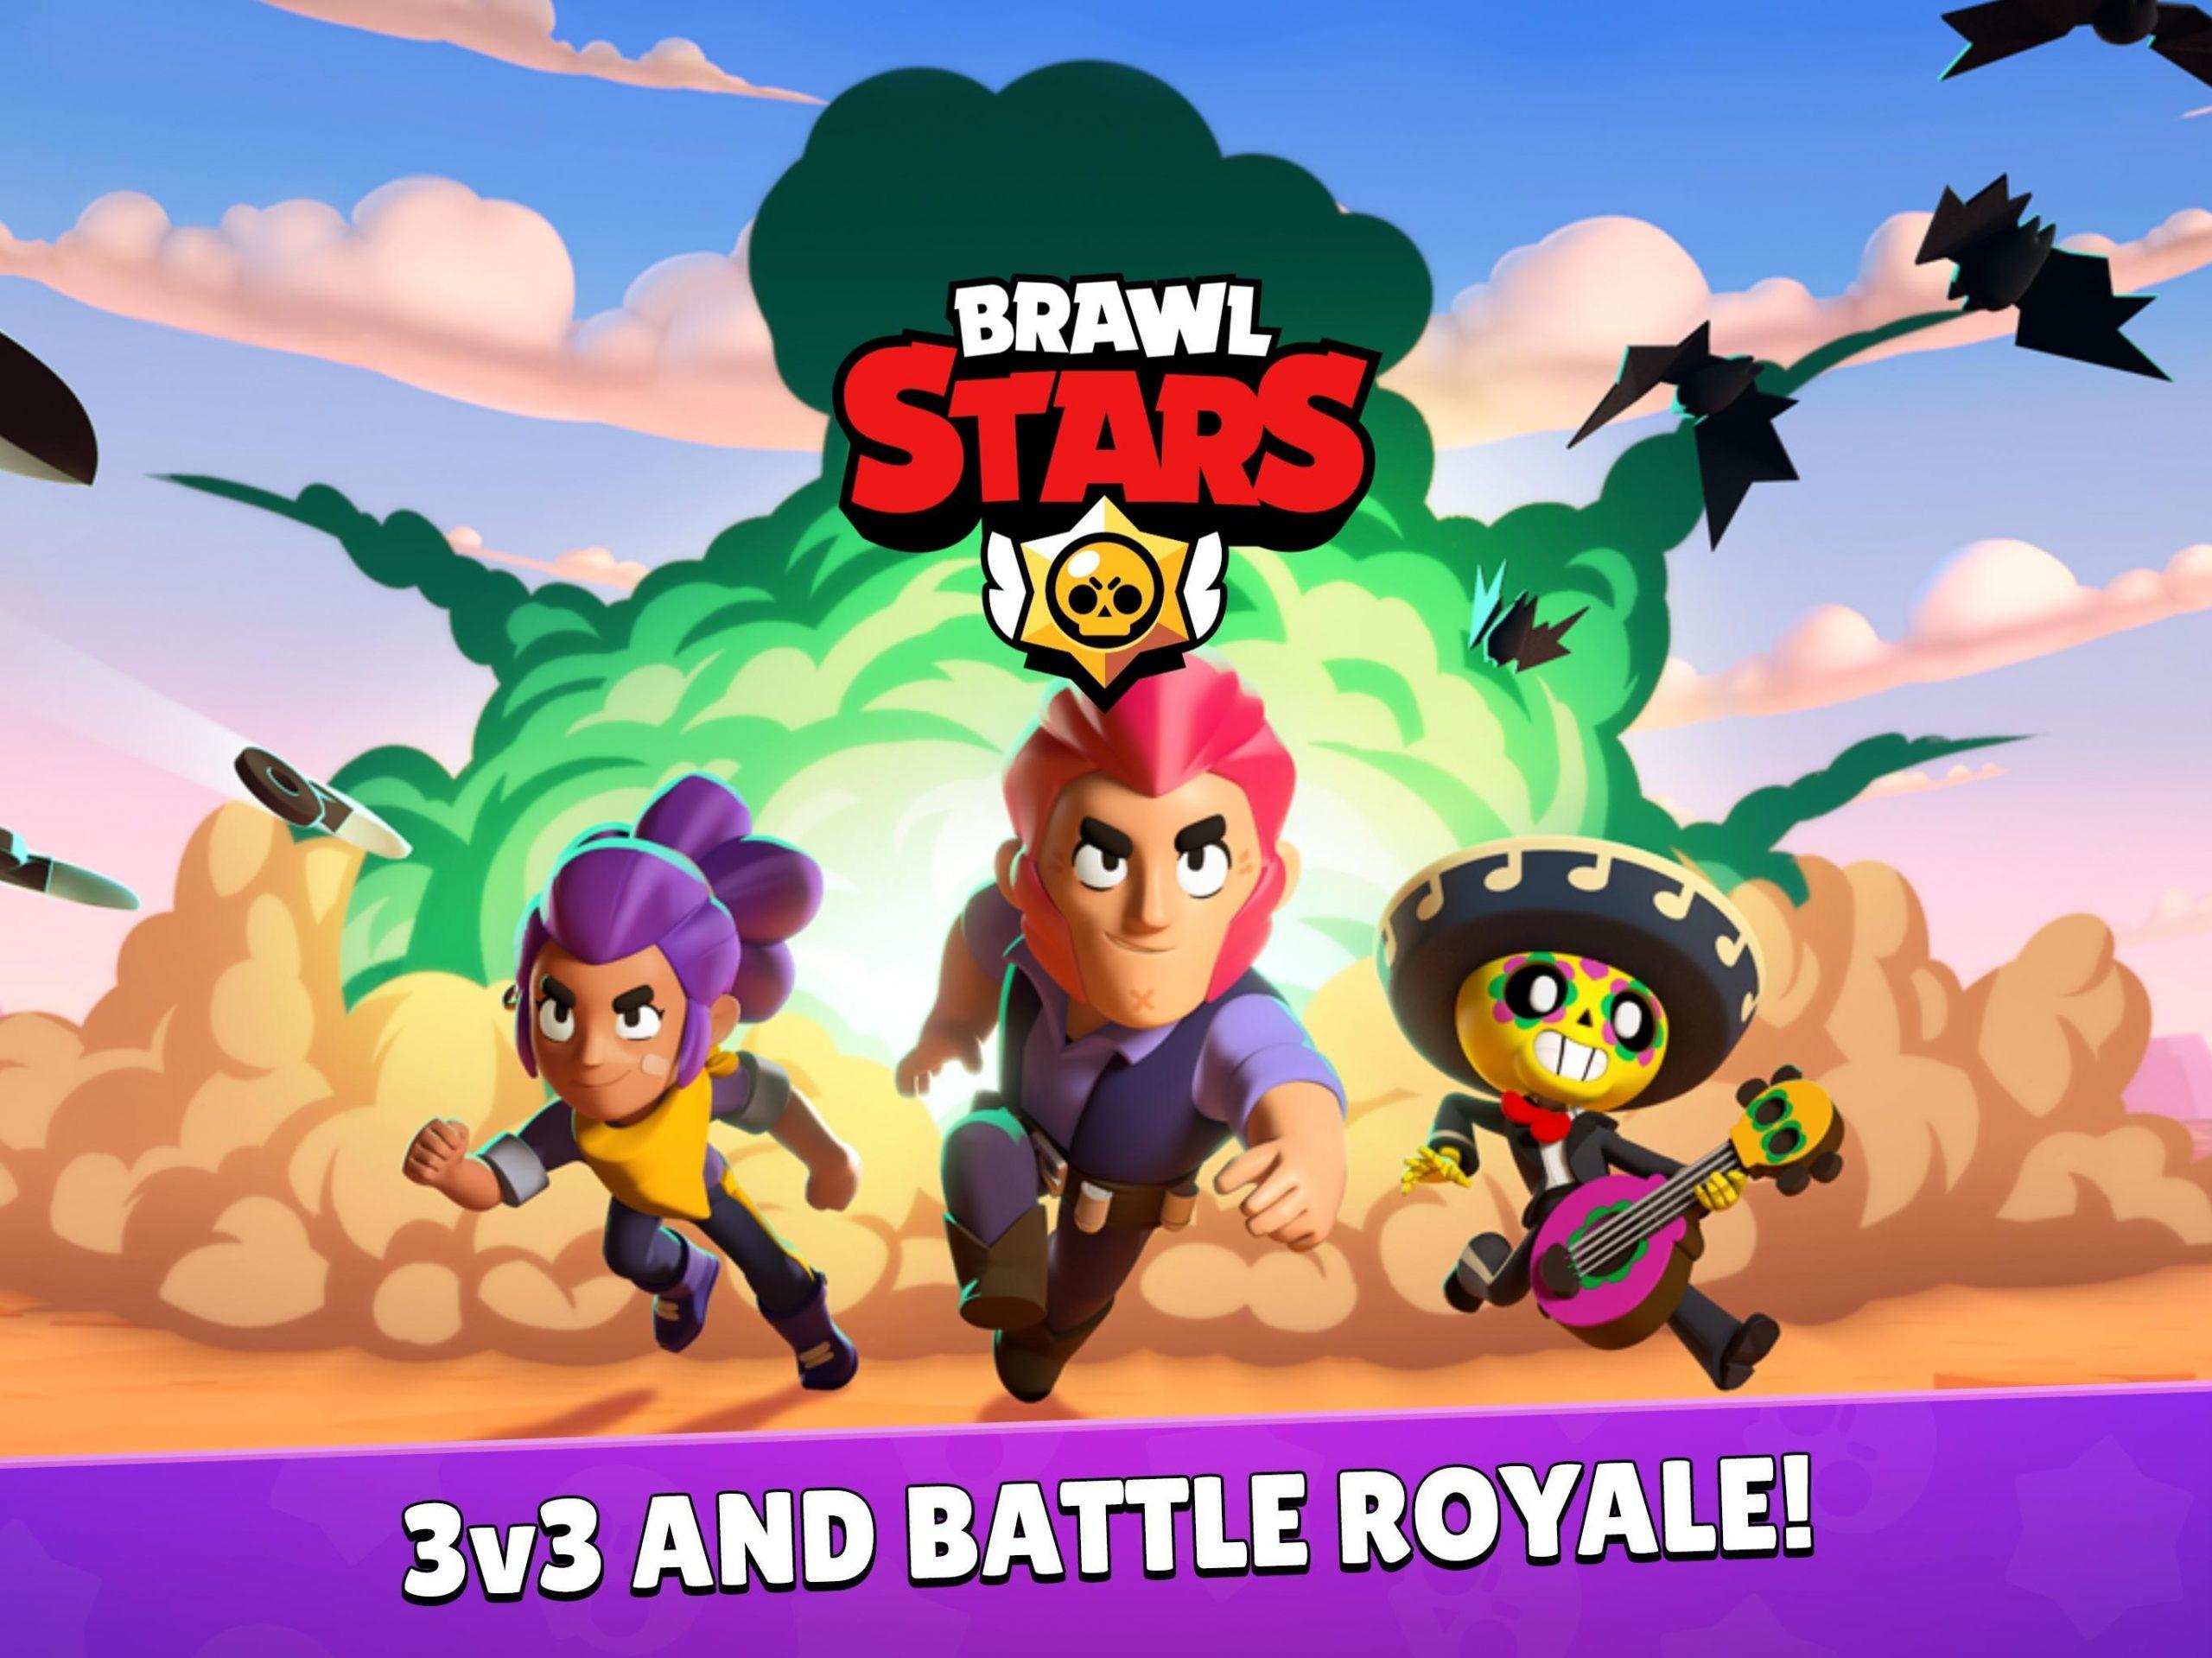 Brawl Stars APK Download, pick up your hero characters in Brawl Stars 36.253 APK for Android – Download …